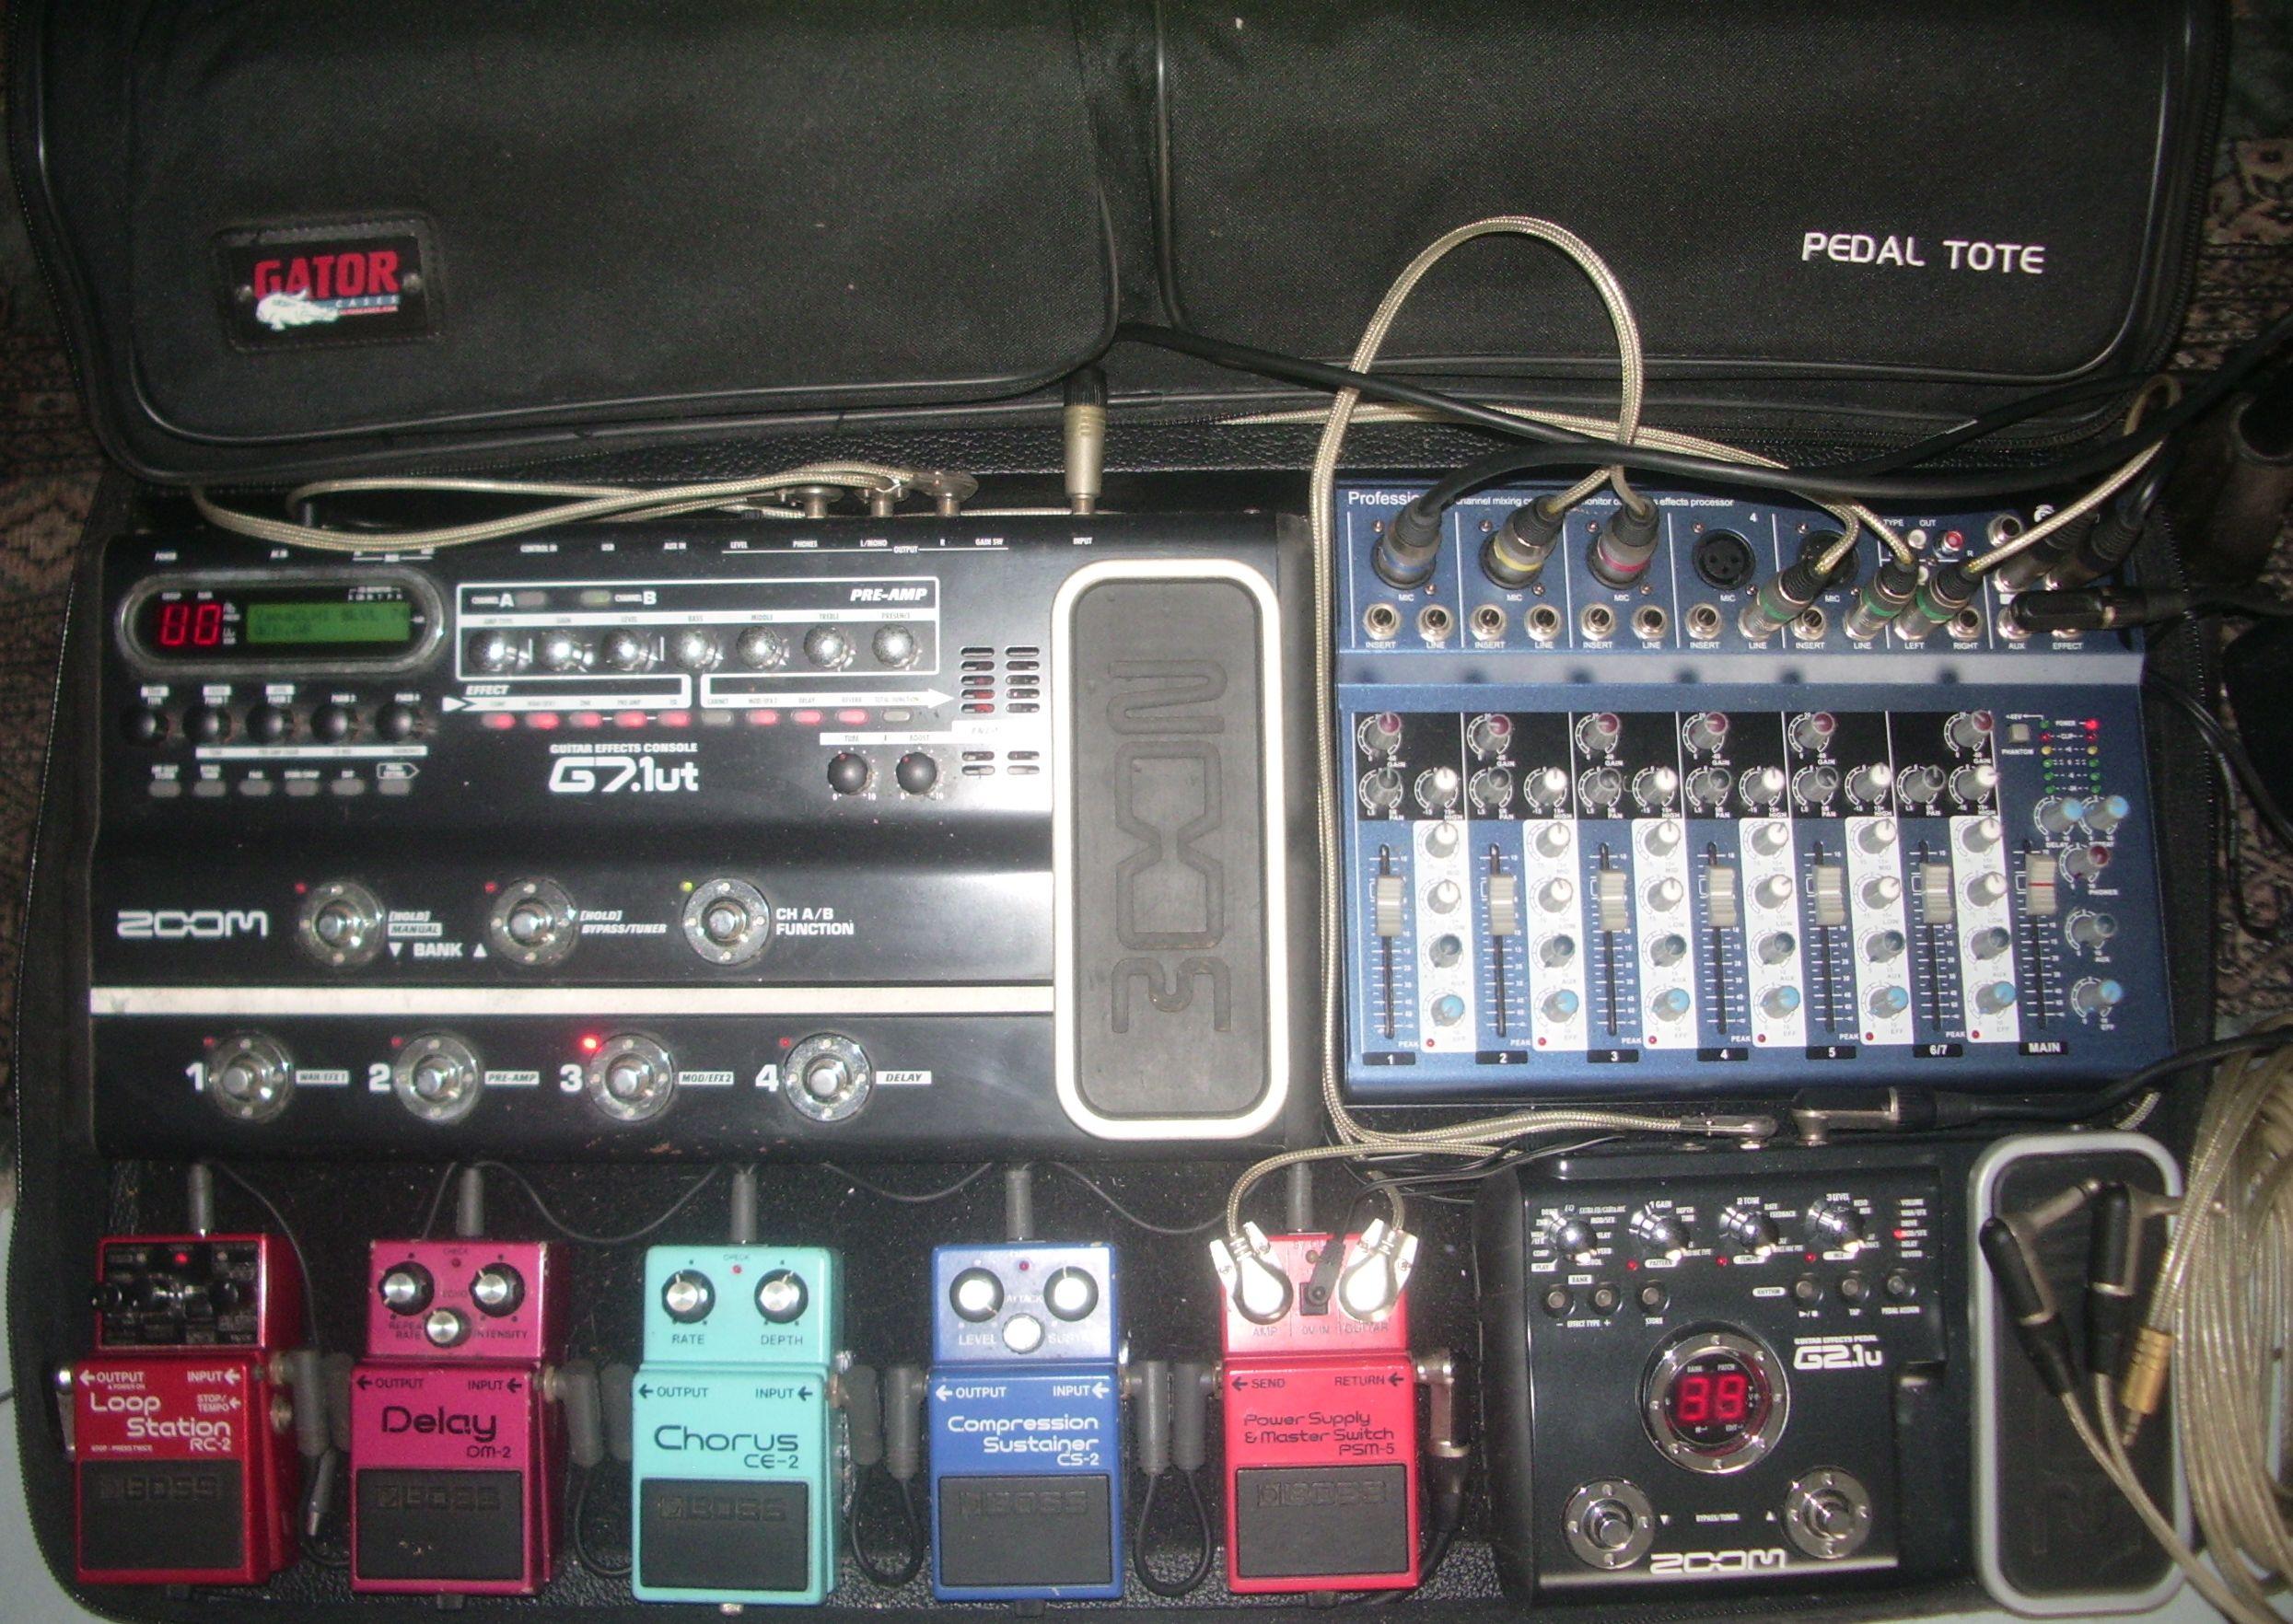 using guitar effects pedals for vocals etc gearslutz pro audio community. Black Bedroom Furniture Sets. Home Design Ideas